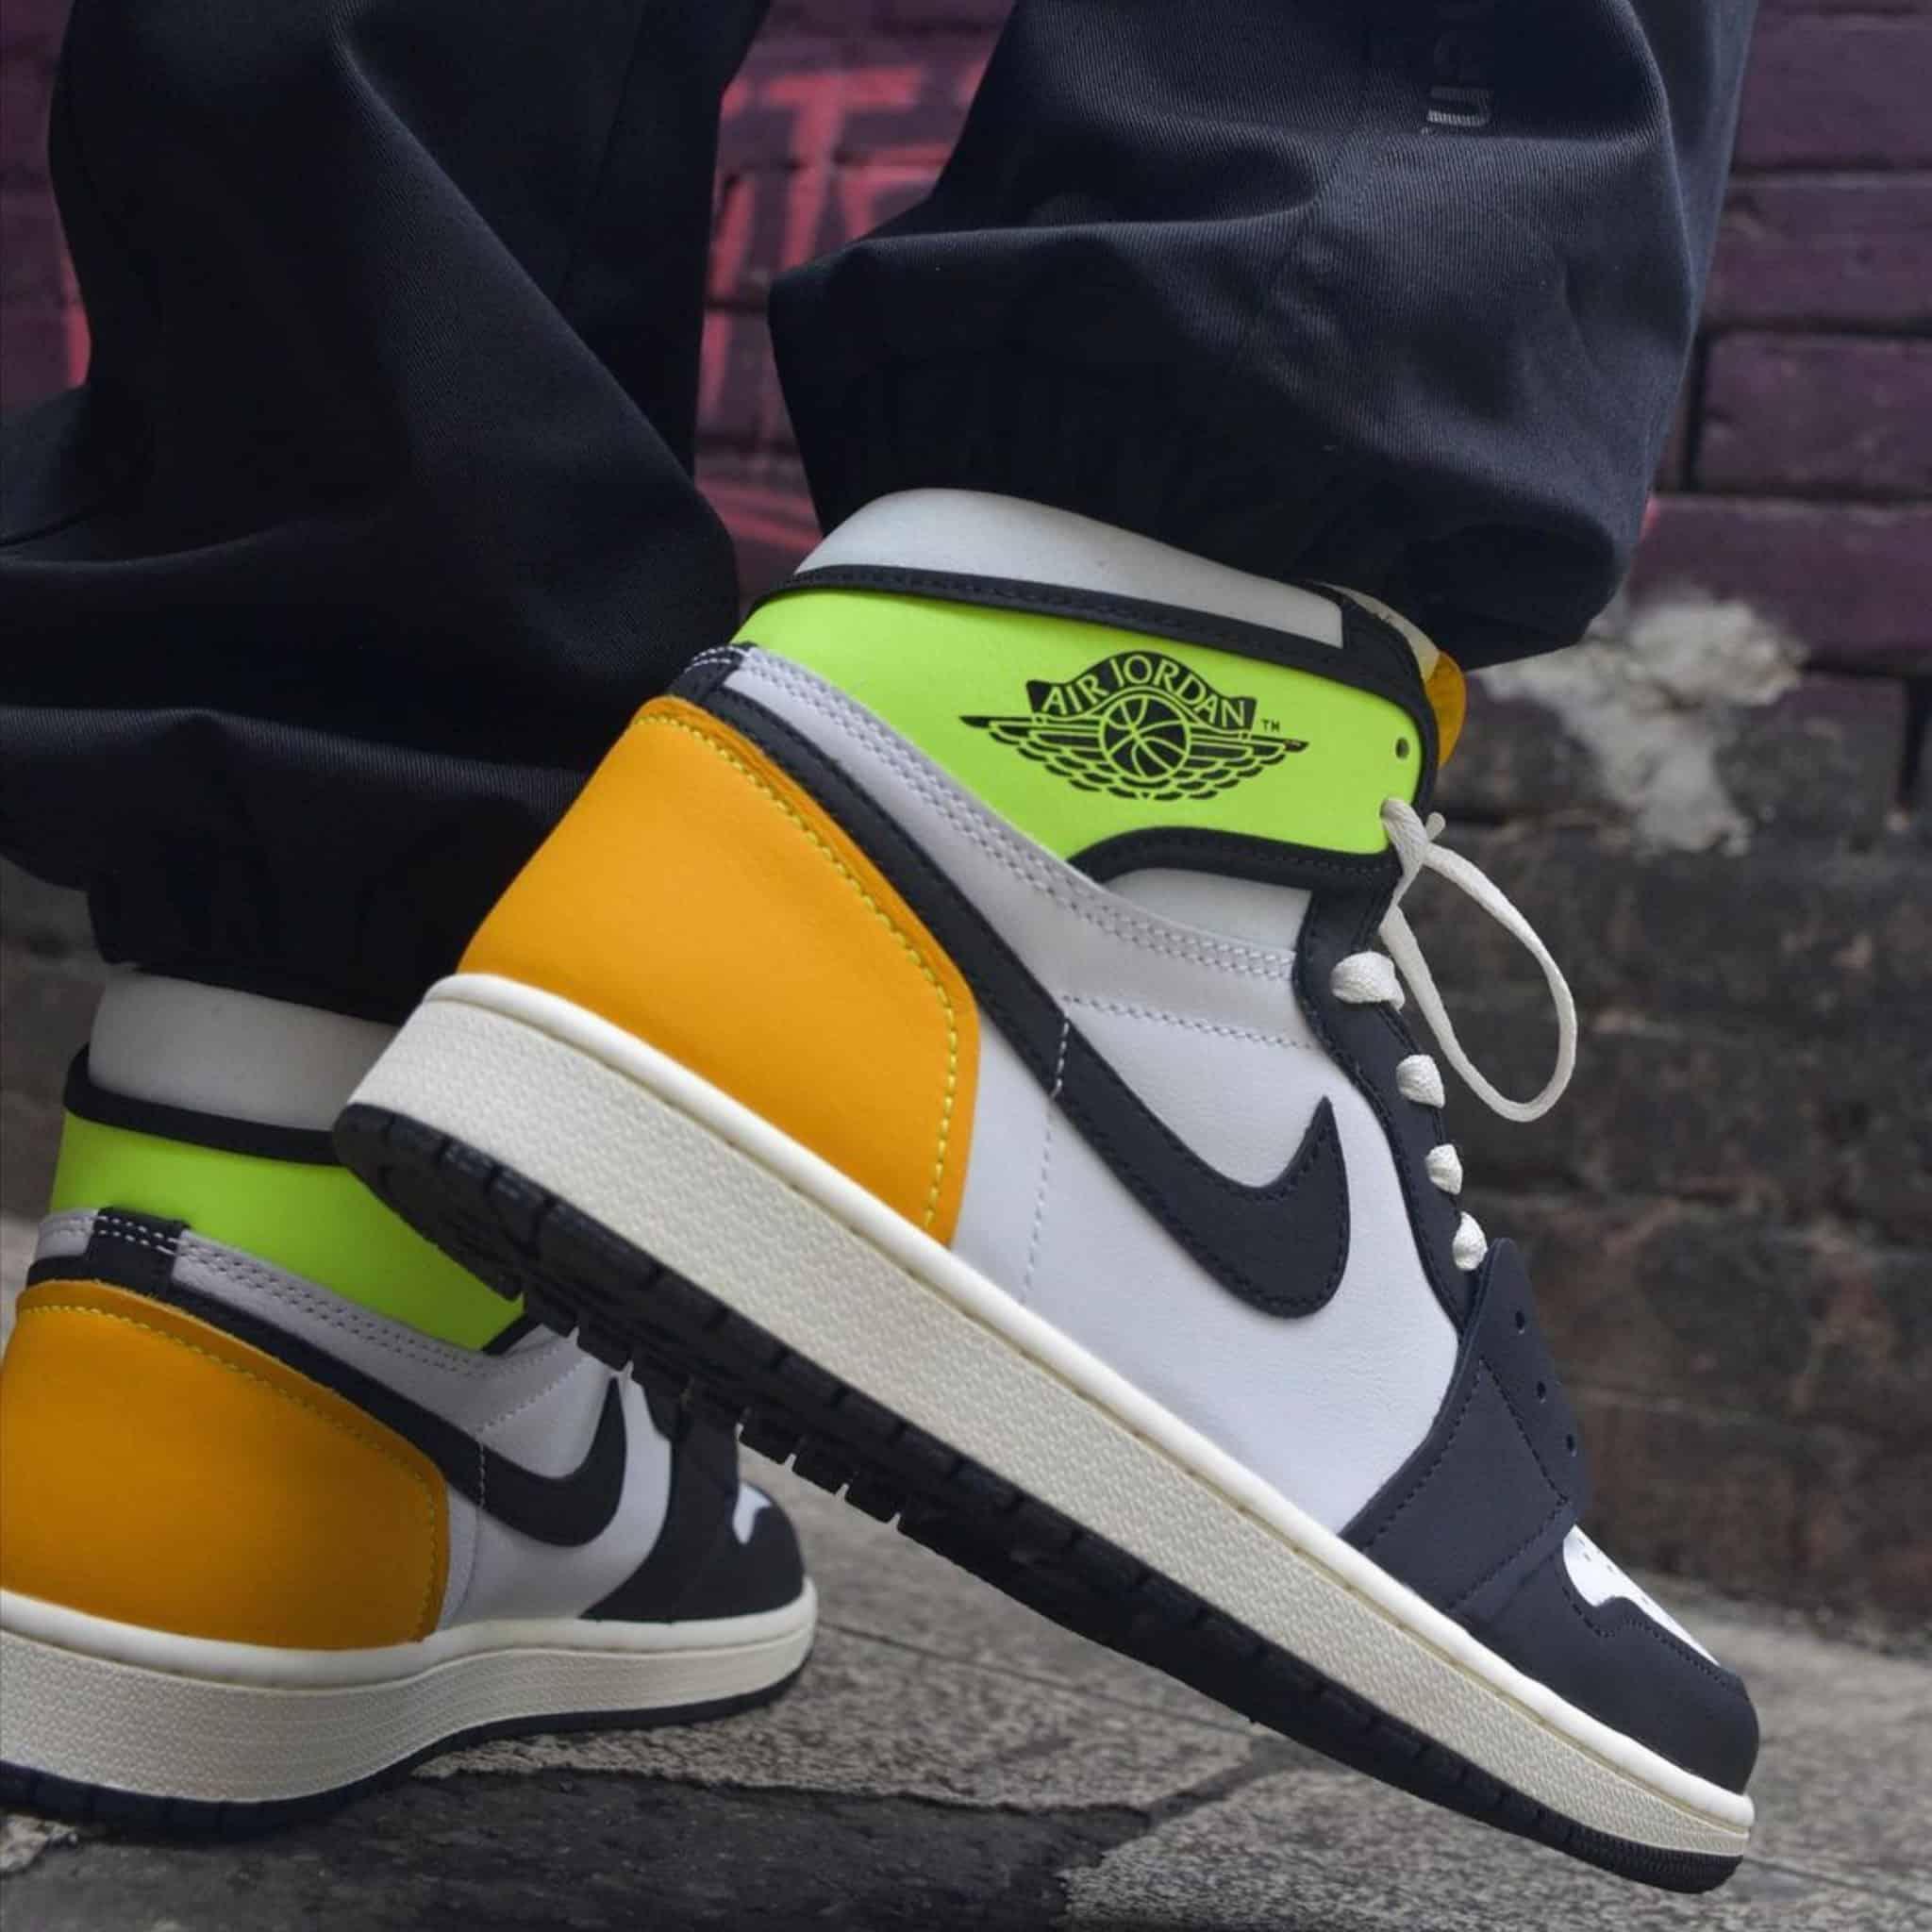 """Volt Gold"" Air Jordan 1 on feet"